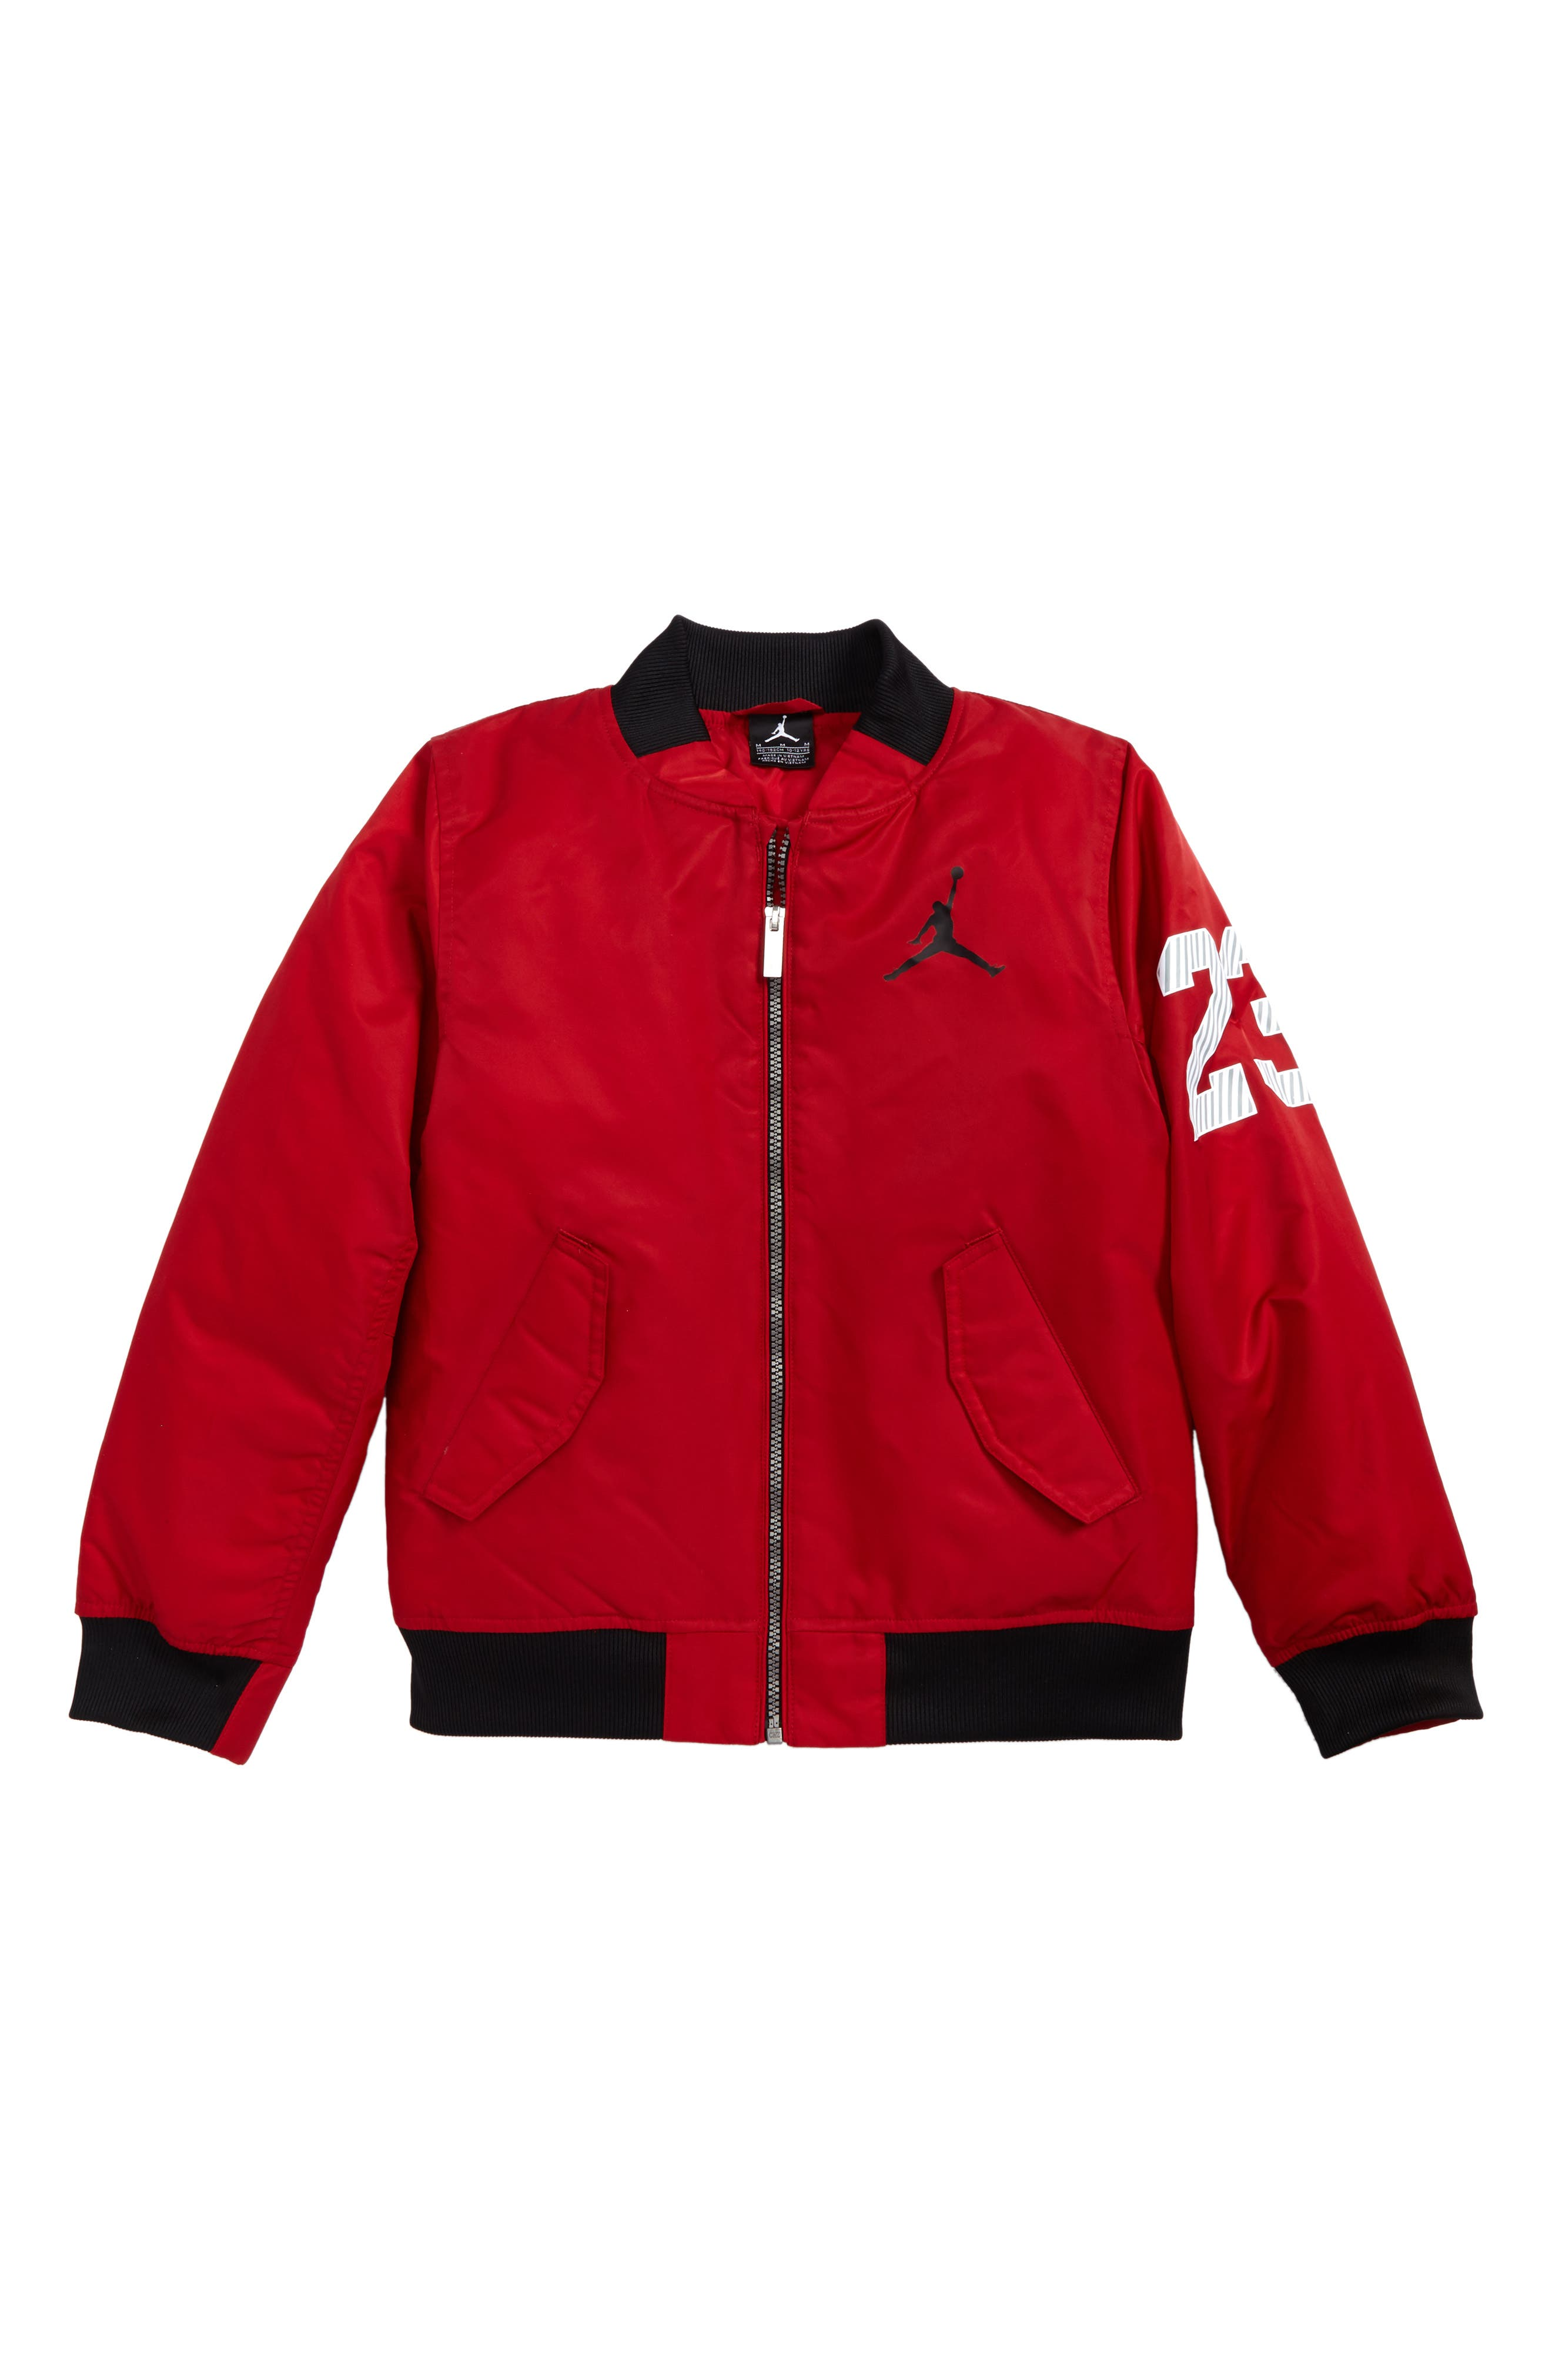 Jordan Fall in Line Jacket,                             Main thumbnail 1, color,                             606